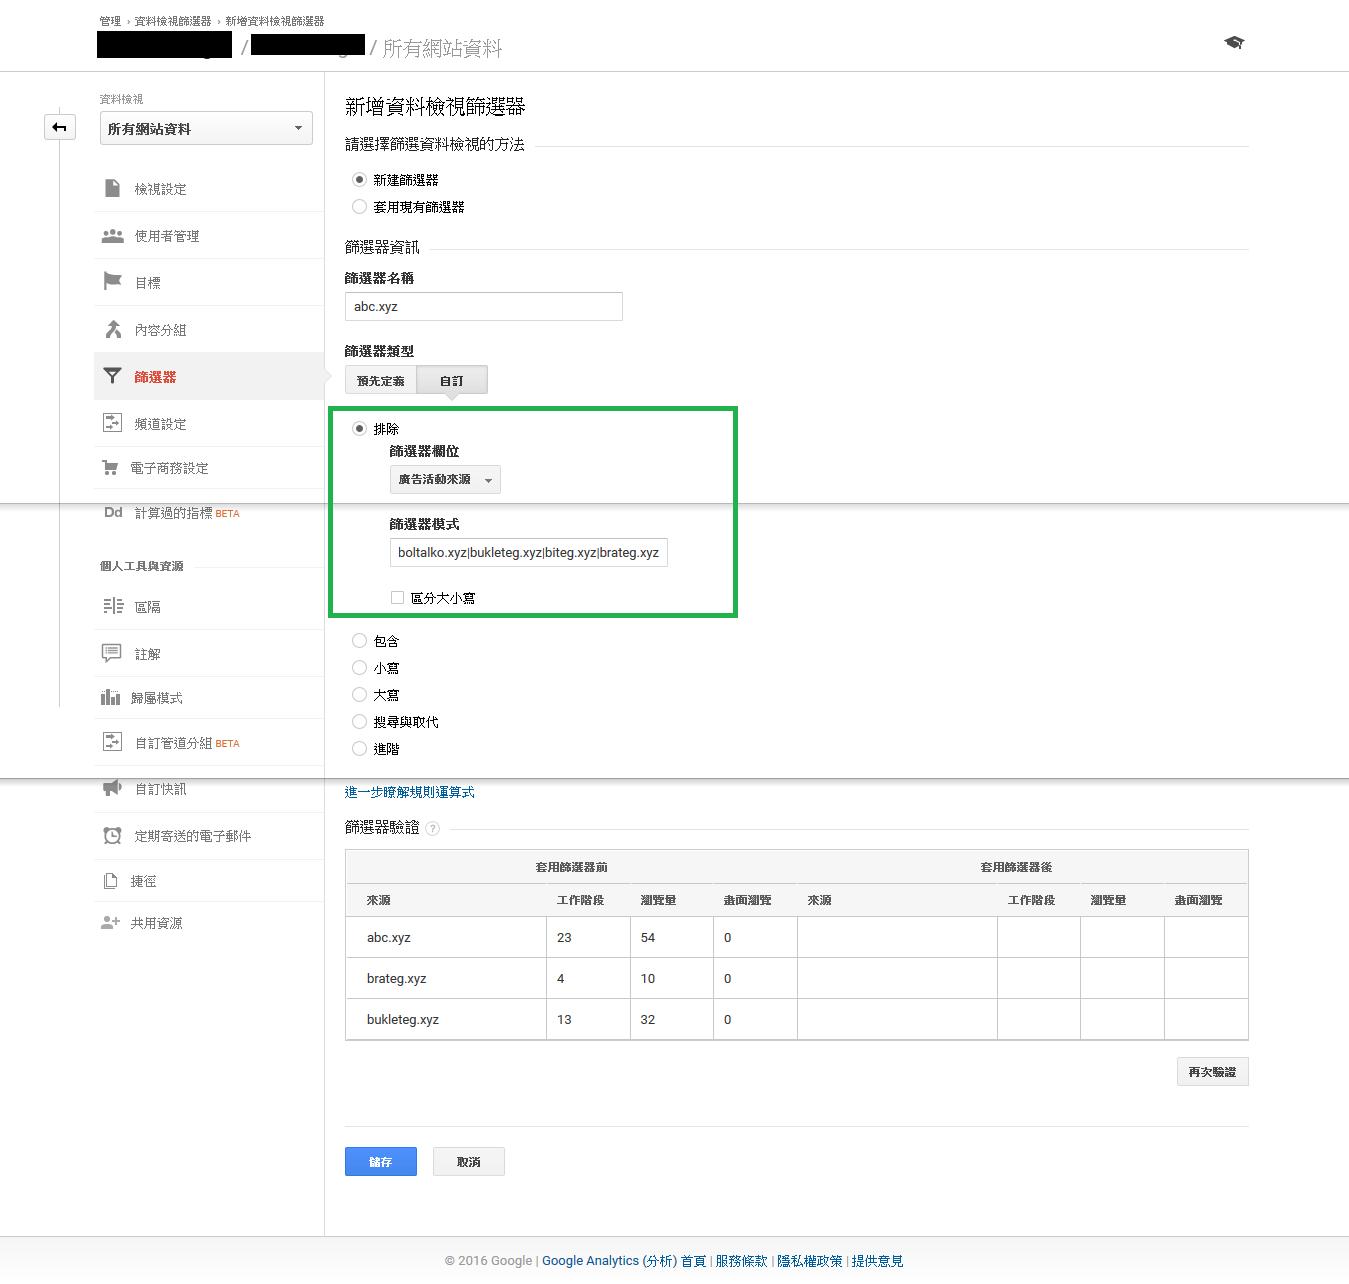 google-analytics-spam-referral-traffic-filter